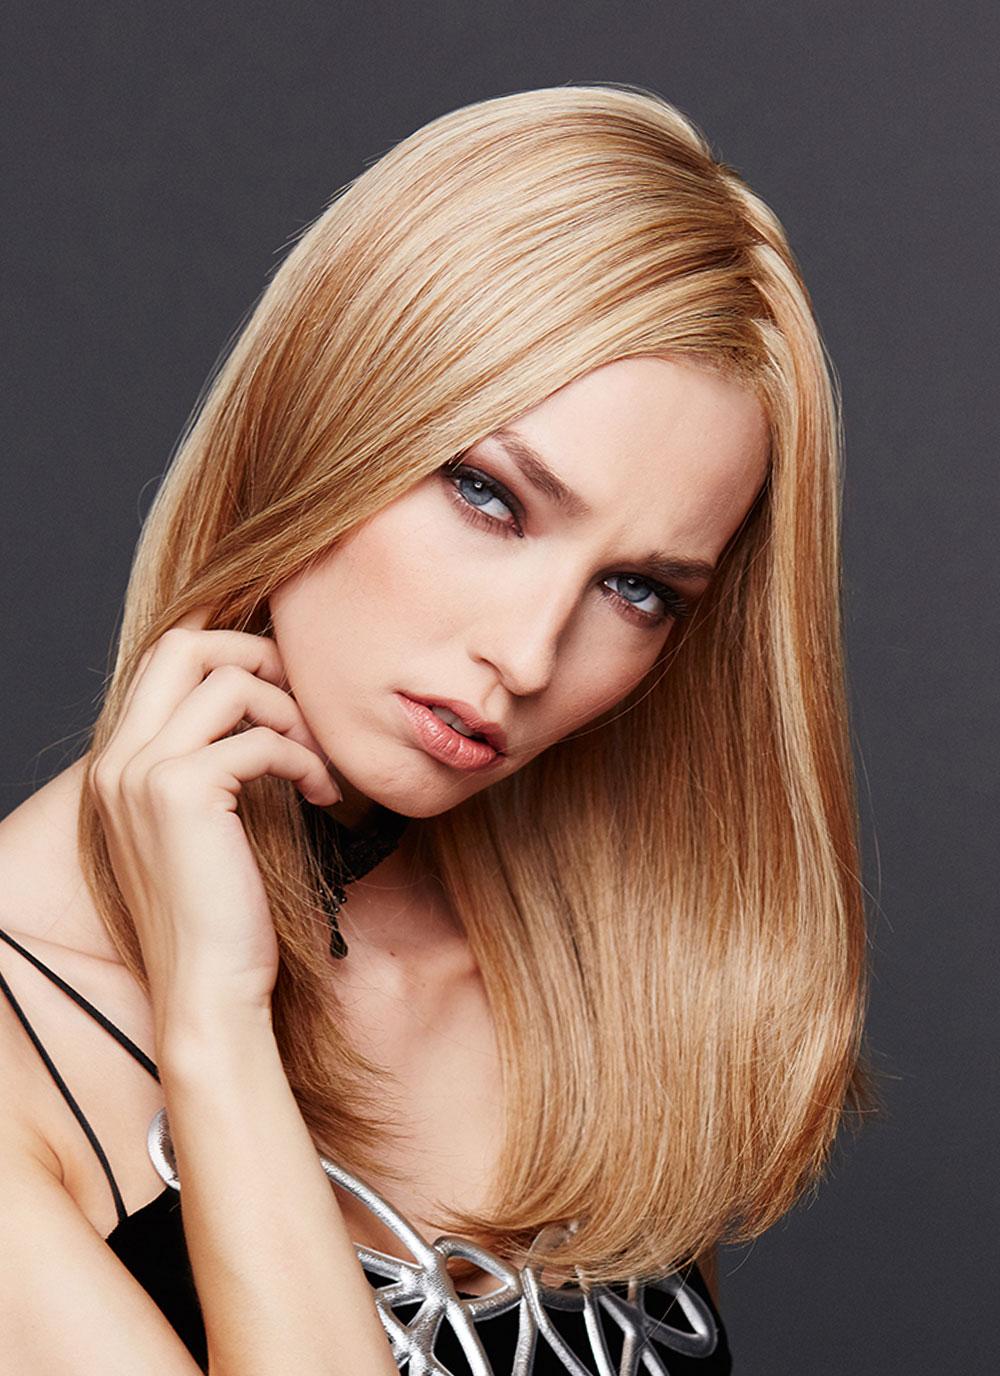 debbie-human-hair-wig-gisela-mayer-4